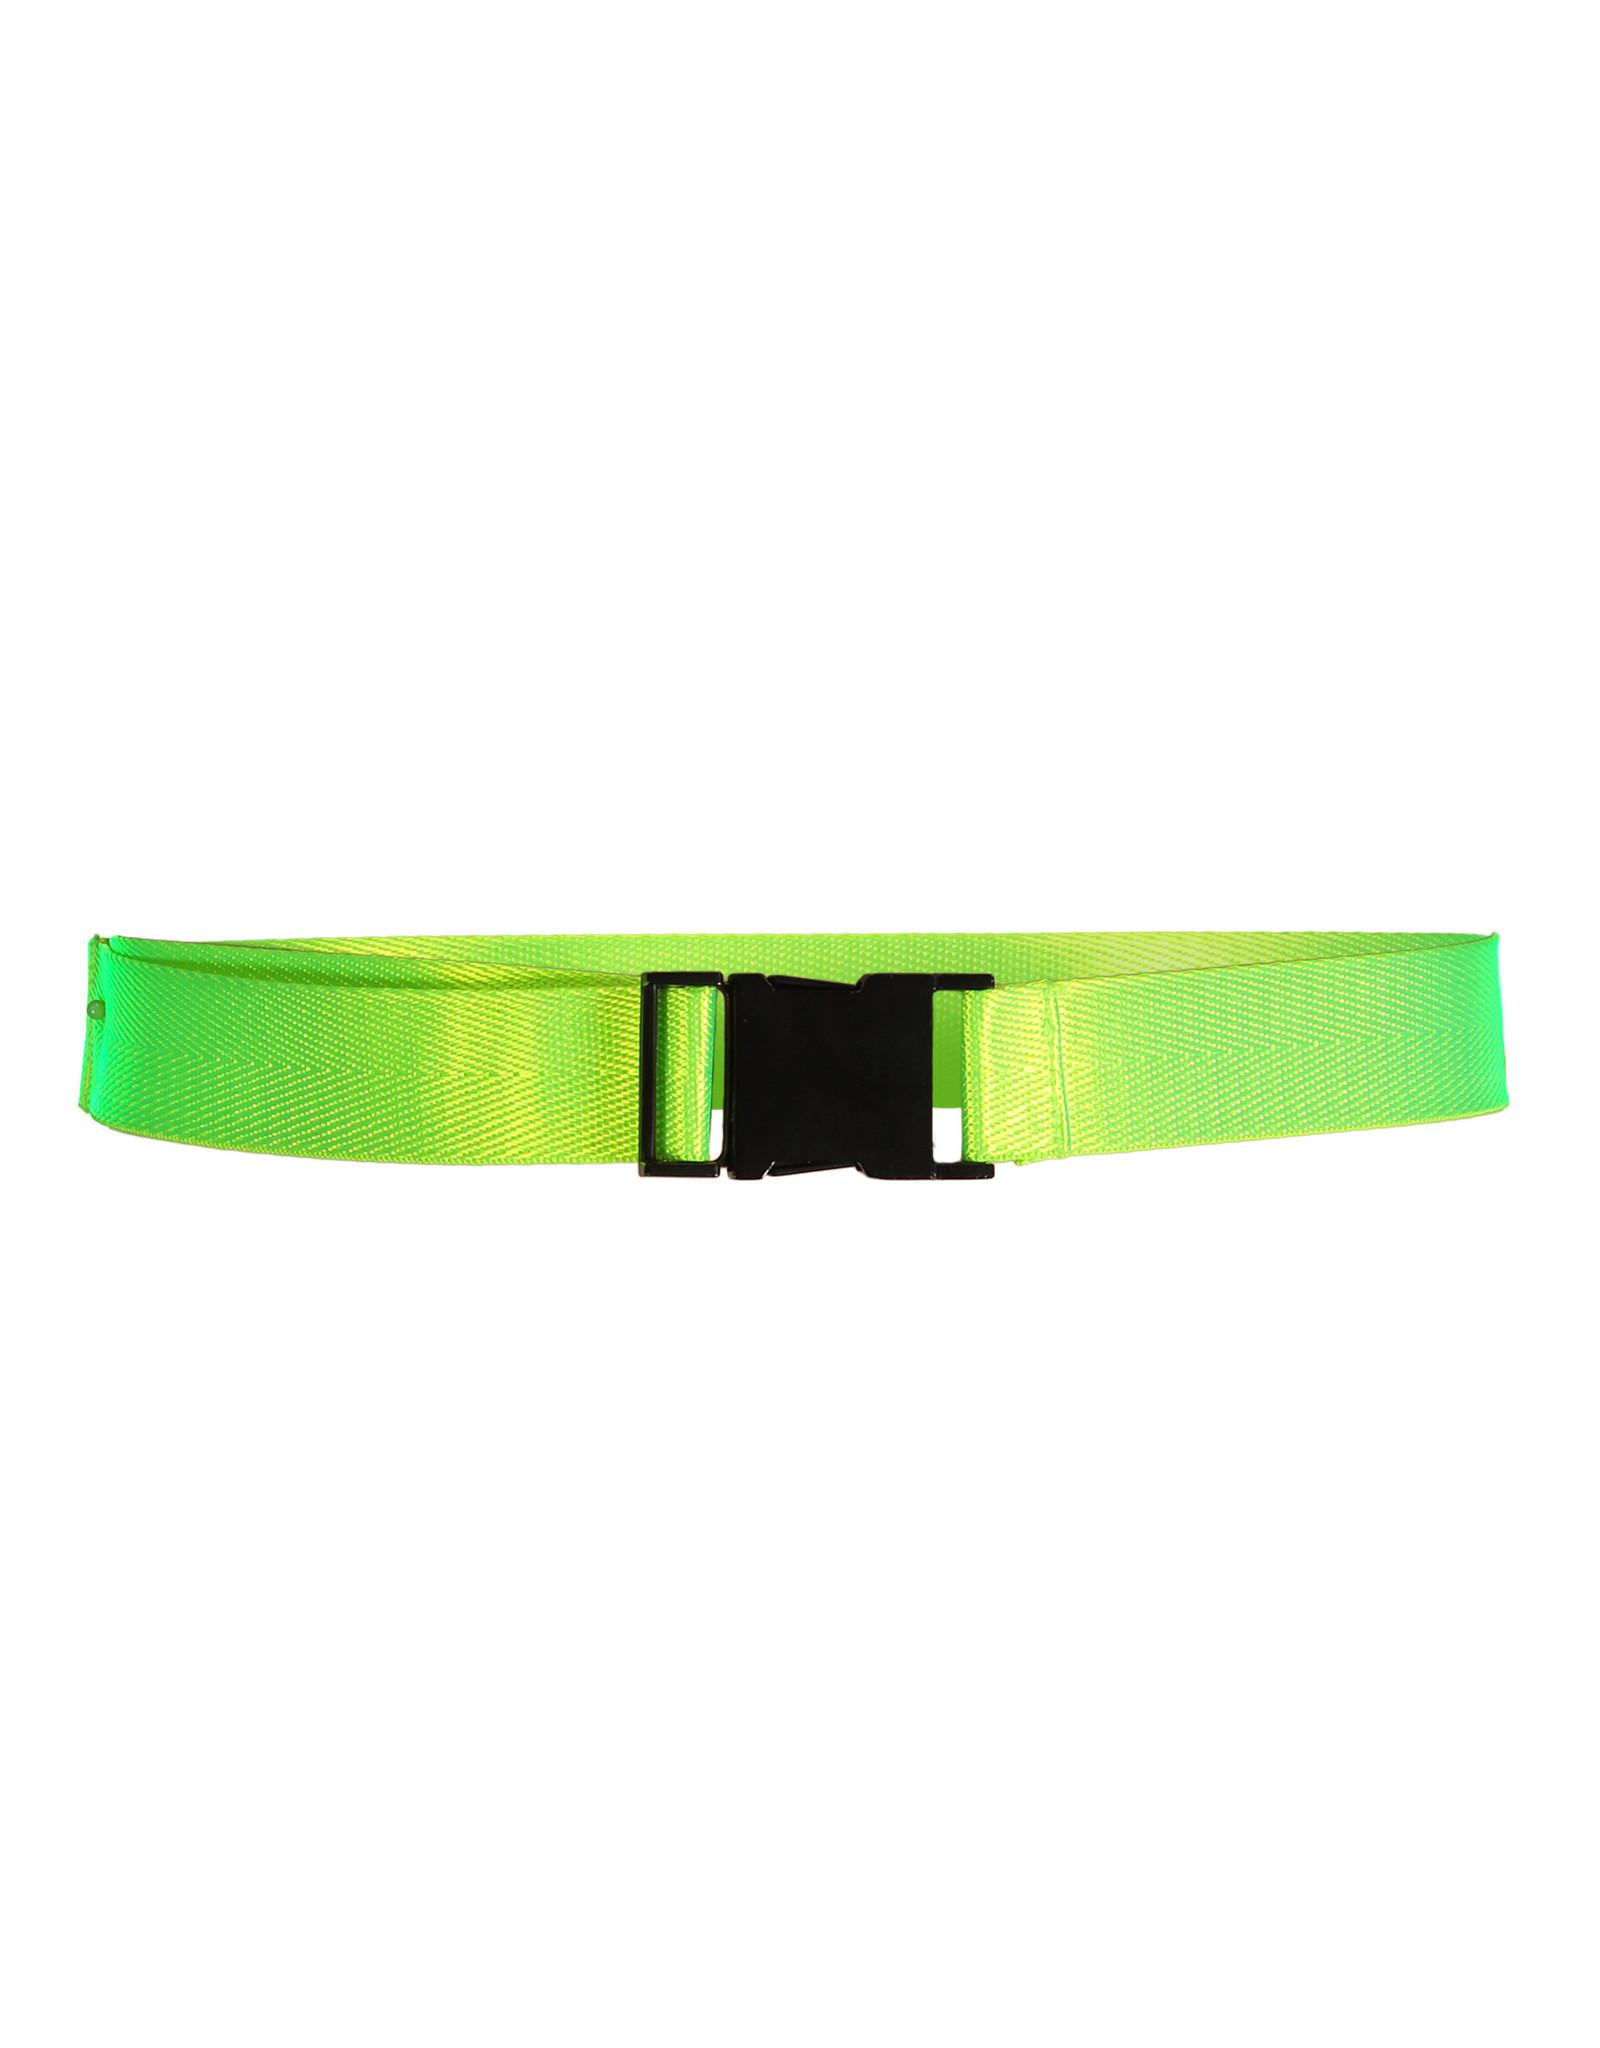 Frankie & Liberty FL203000 Frankie belts